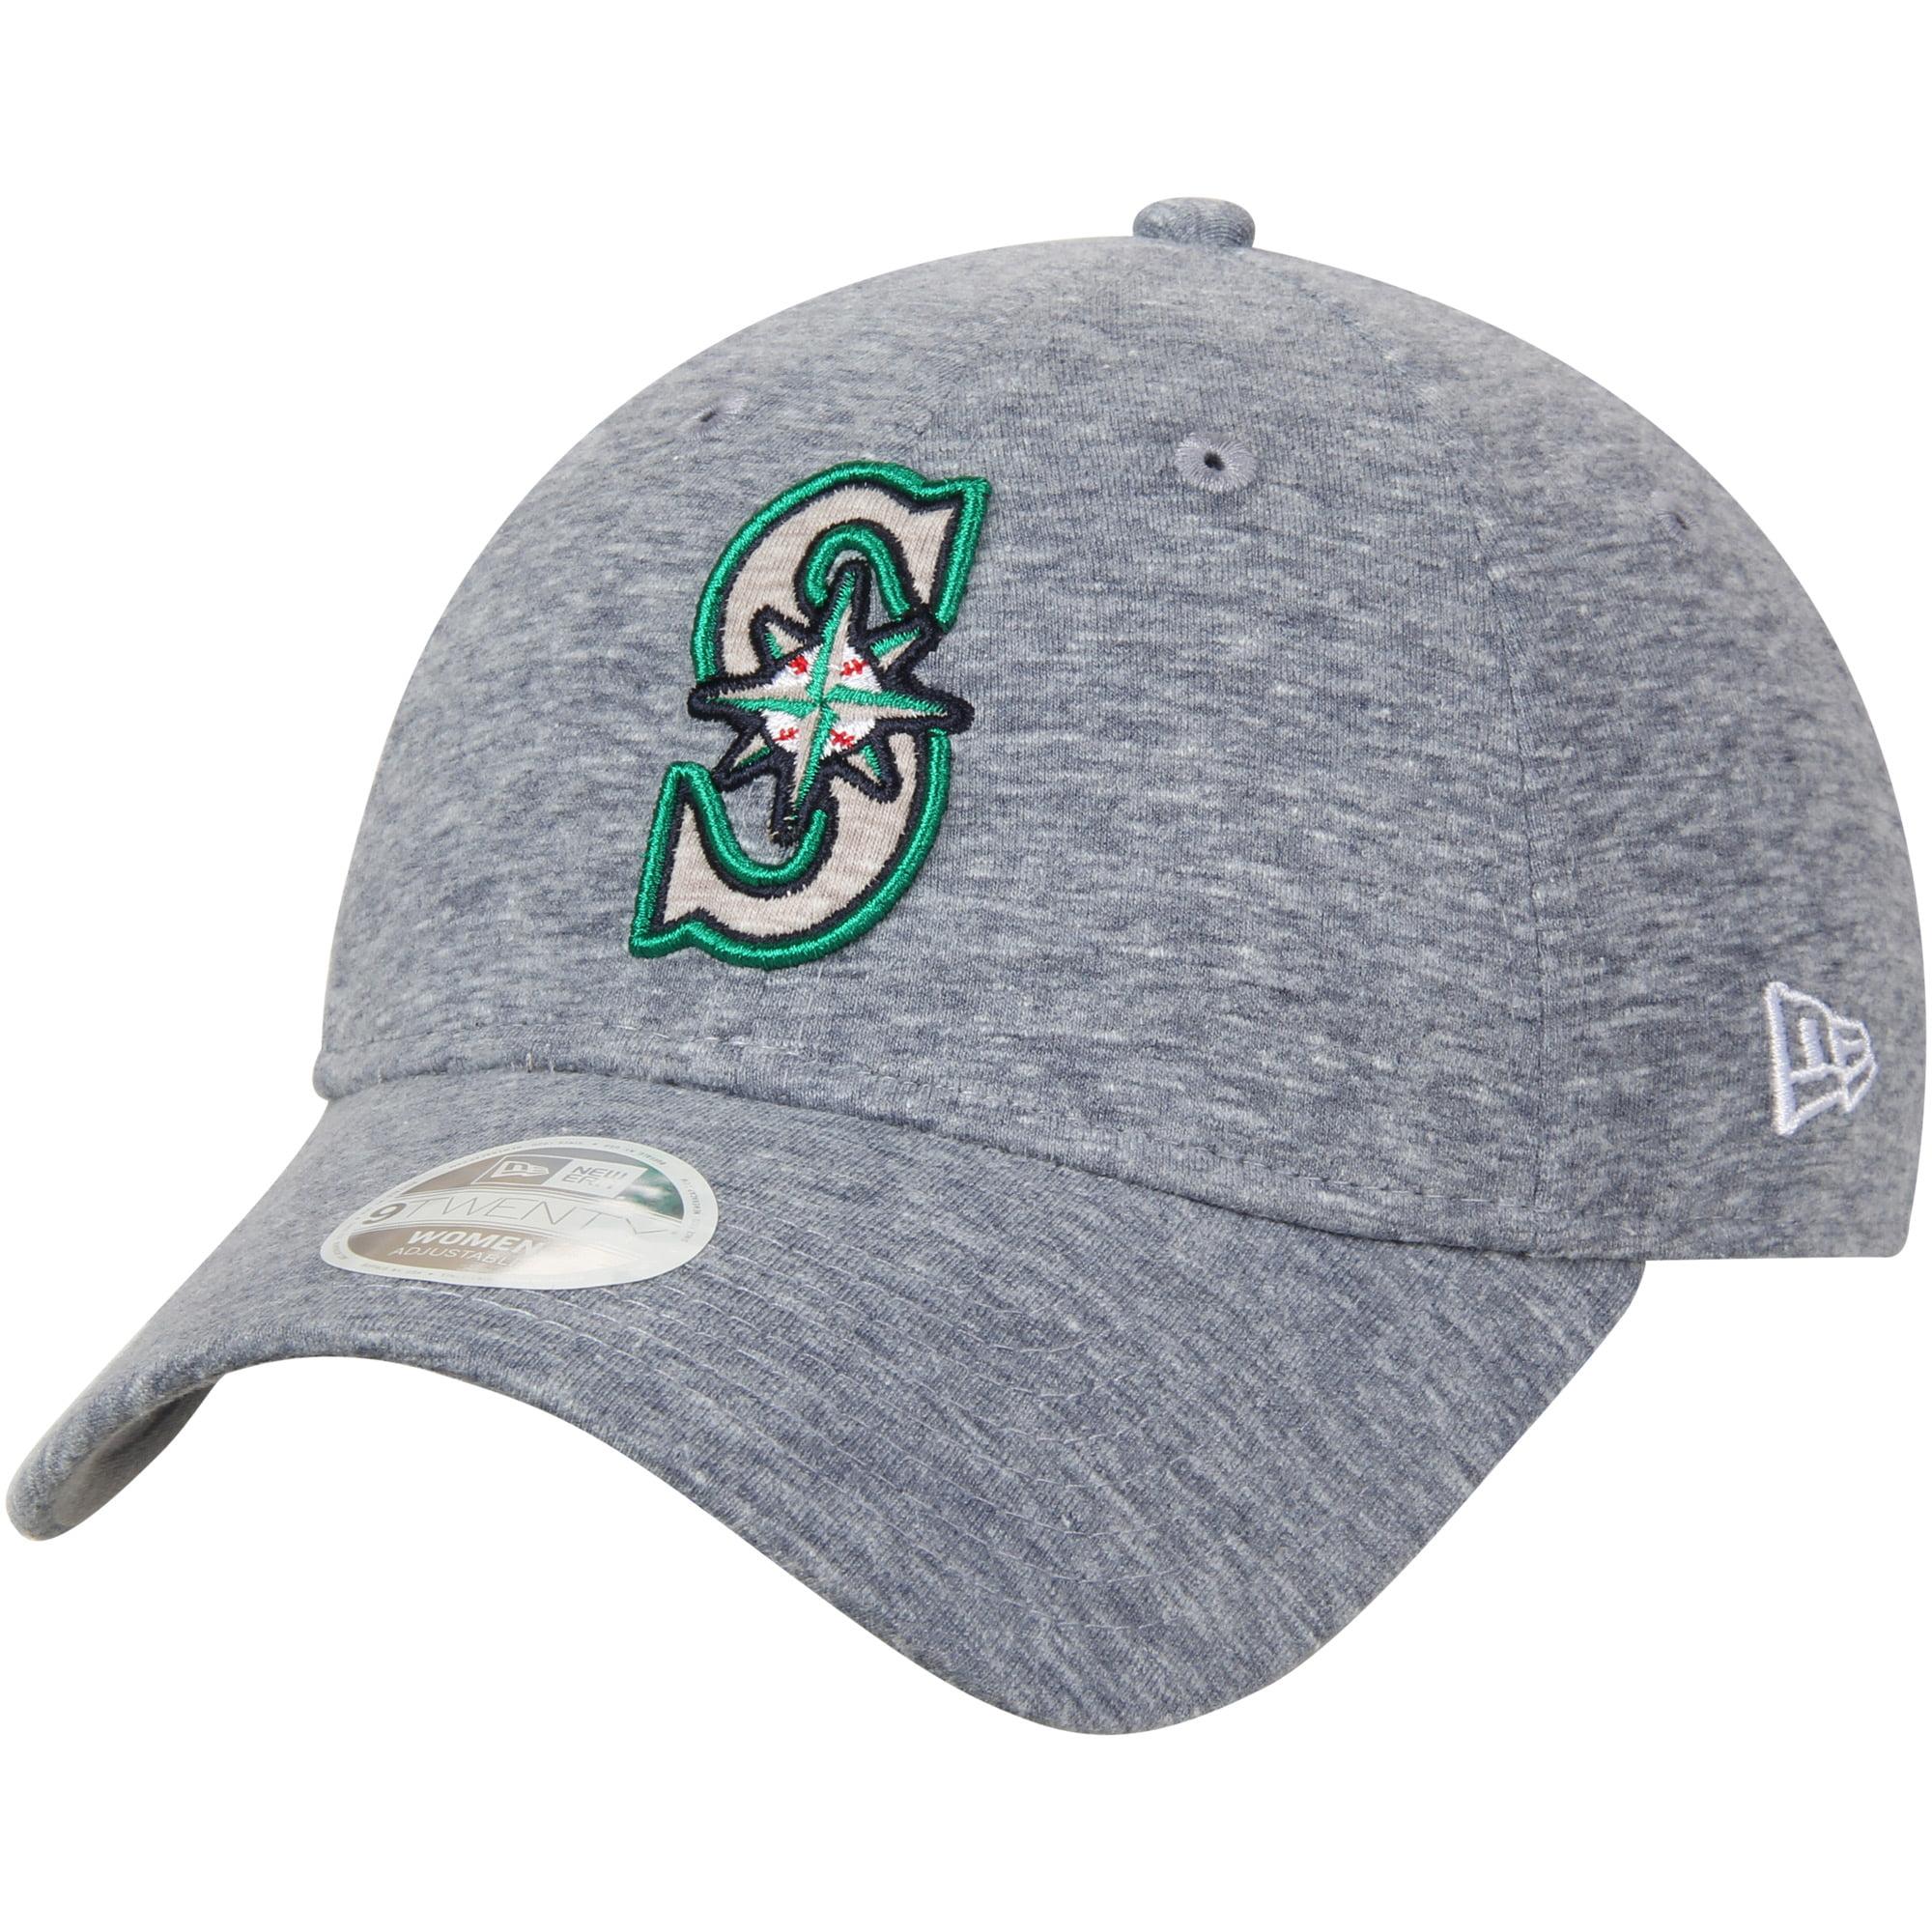 Seattle Mariners New Era Women's Team Multi Tone 9TWENTY Adjustable Hat - Heathered Navy - OSFA